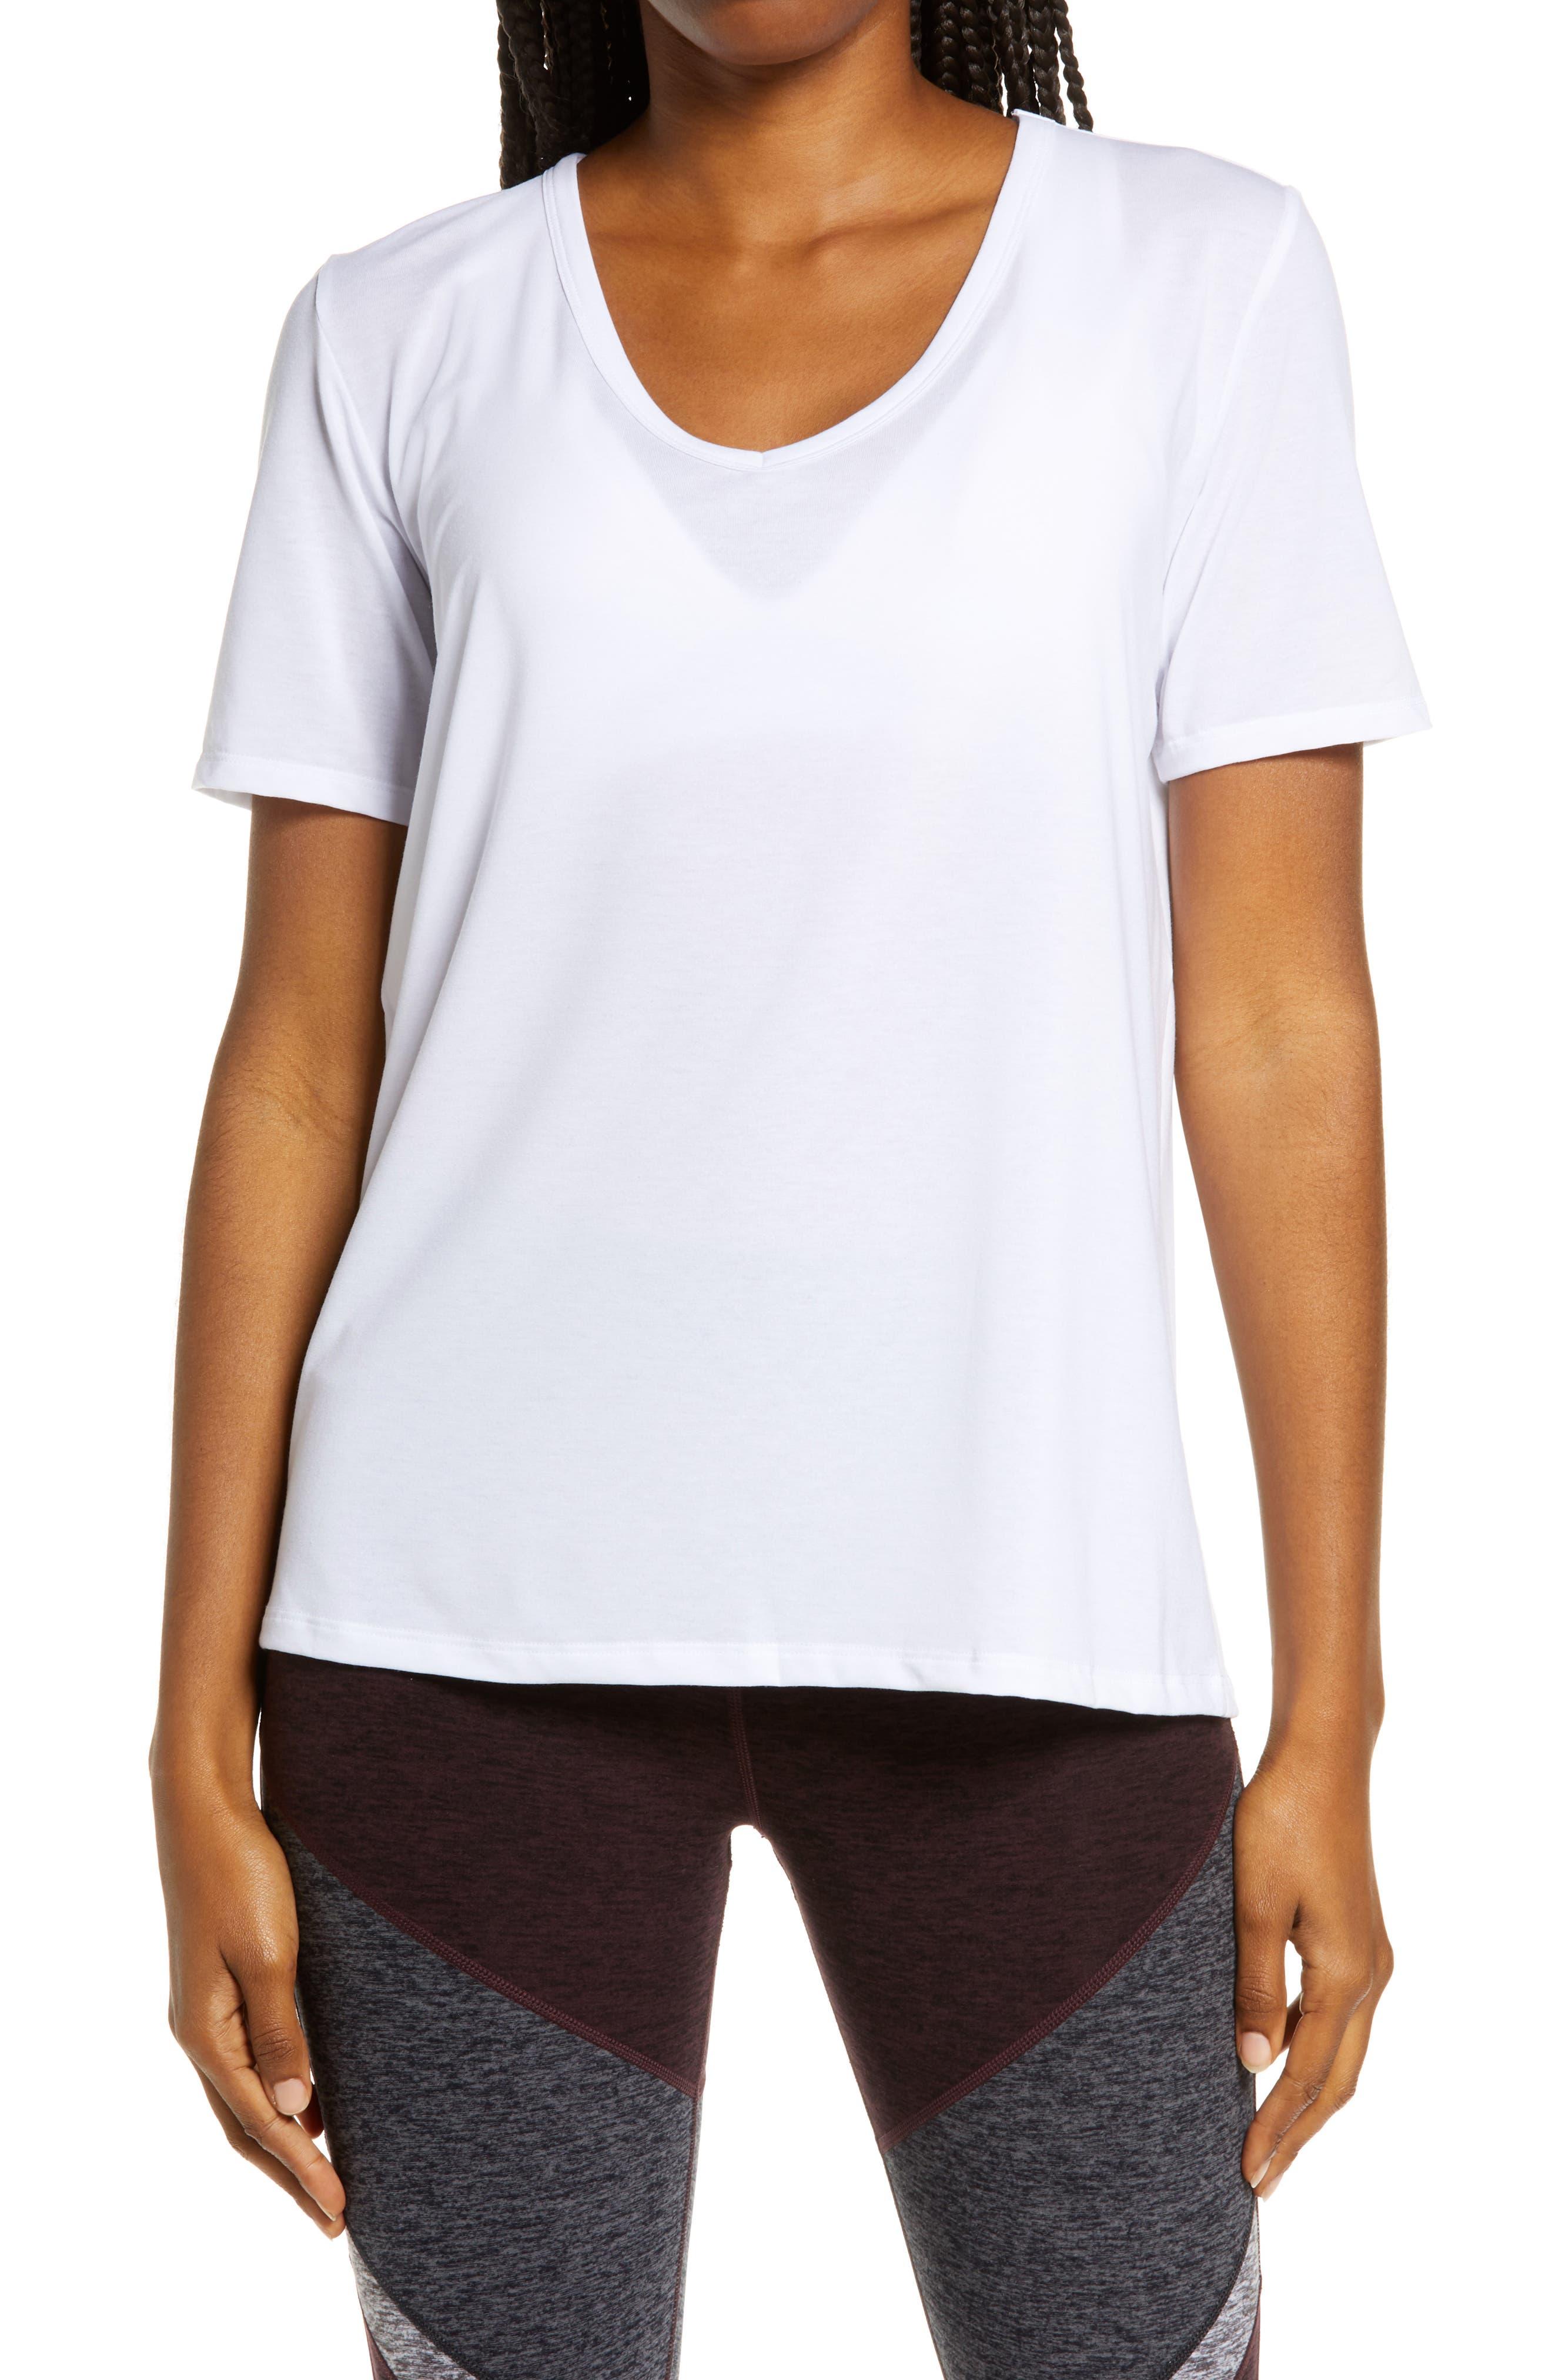 Motion Short Sleeve T-Shirt